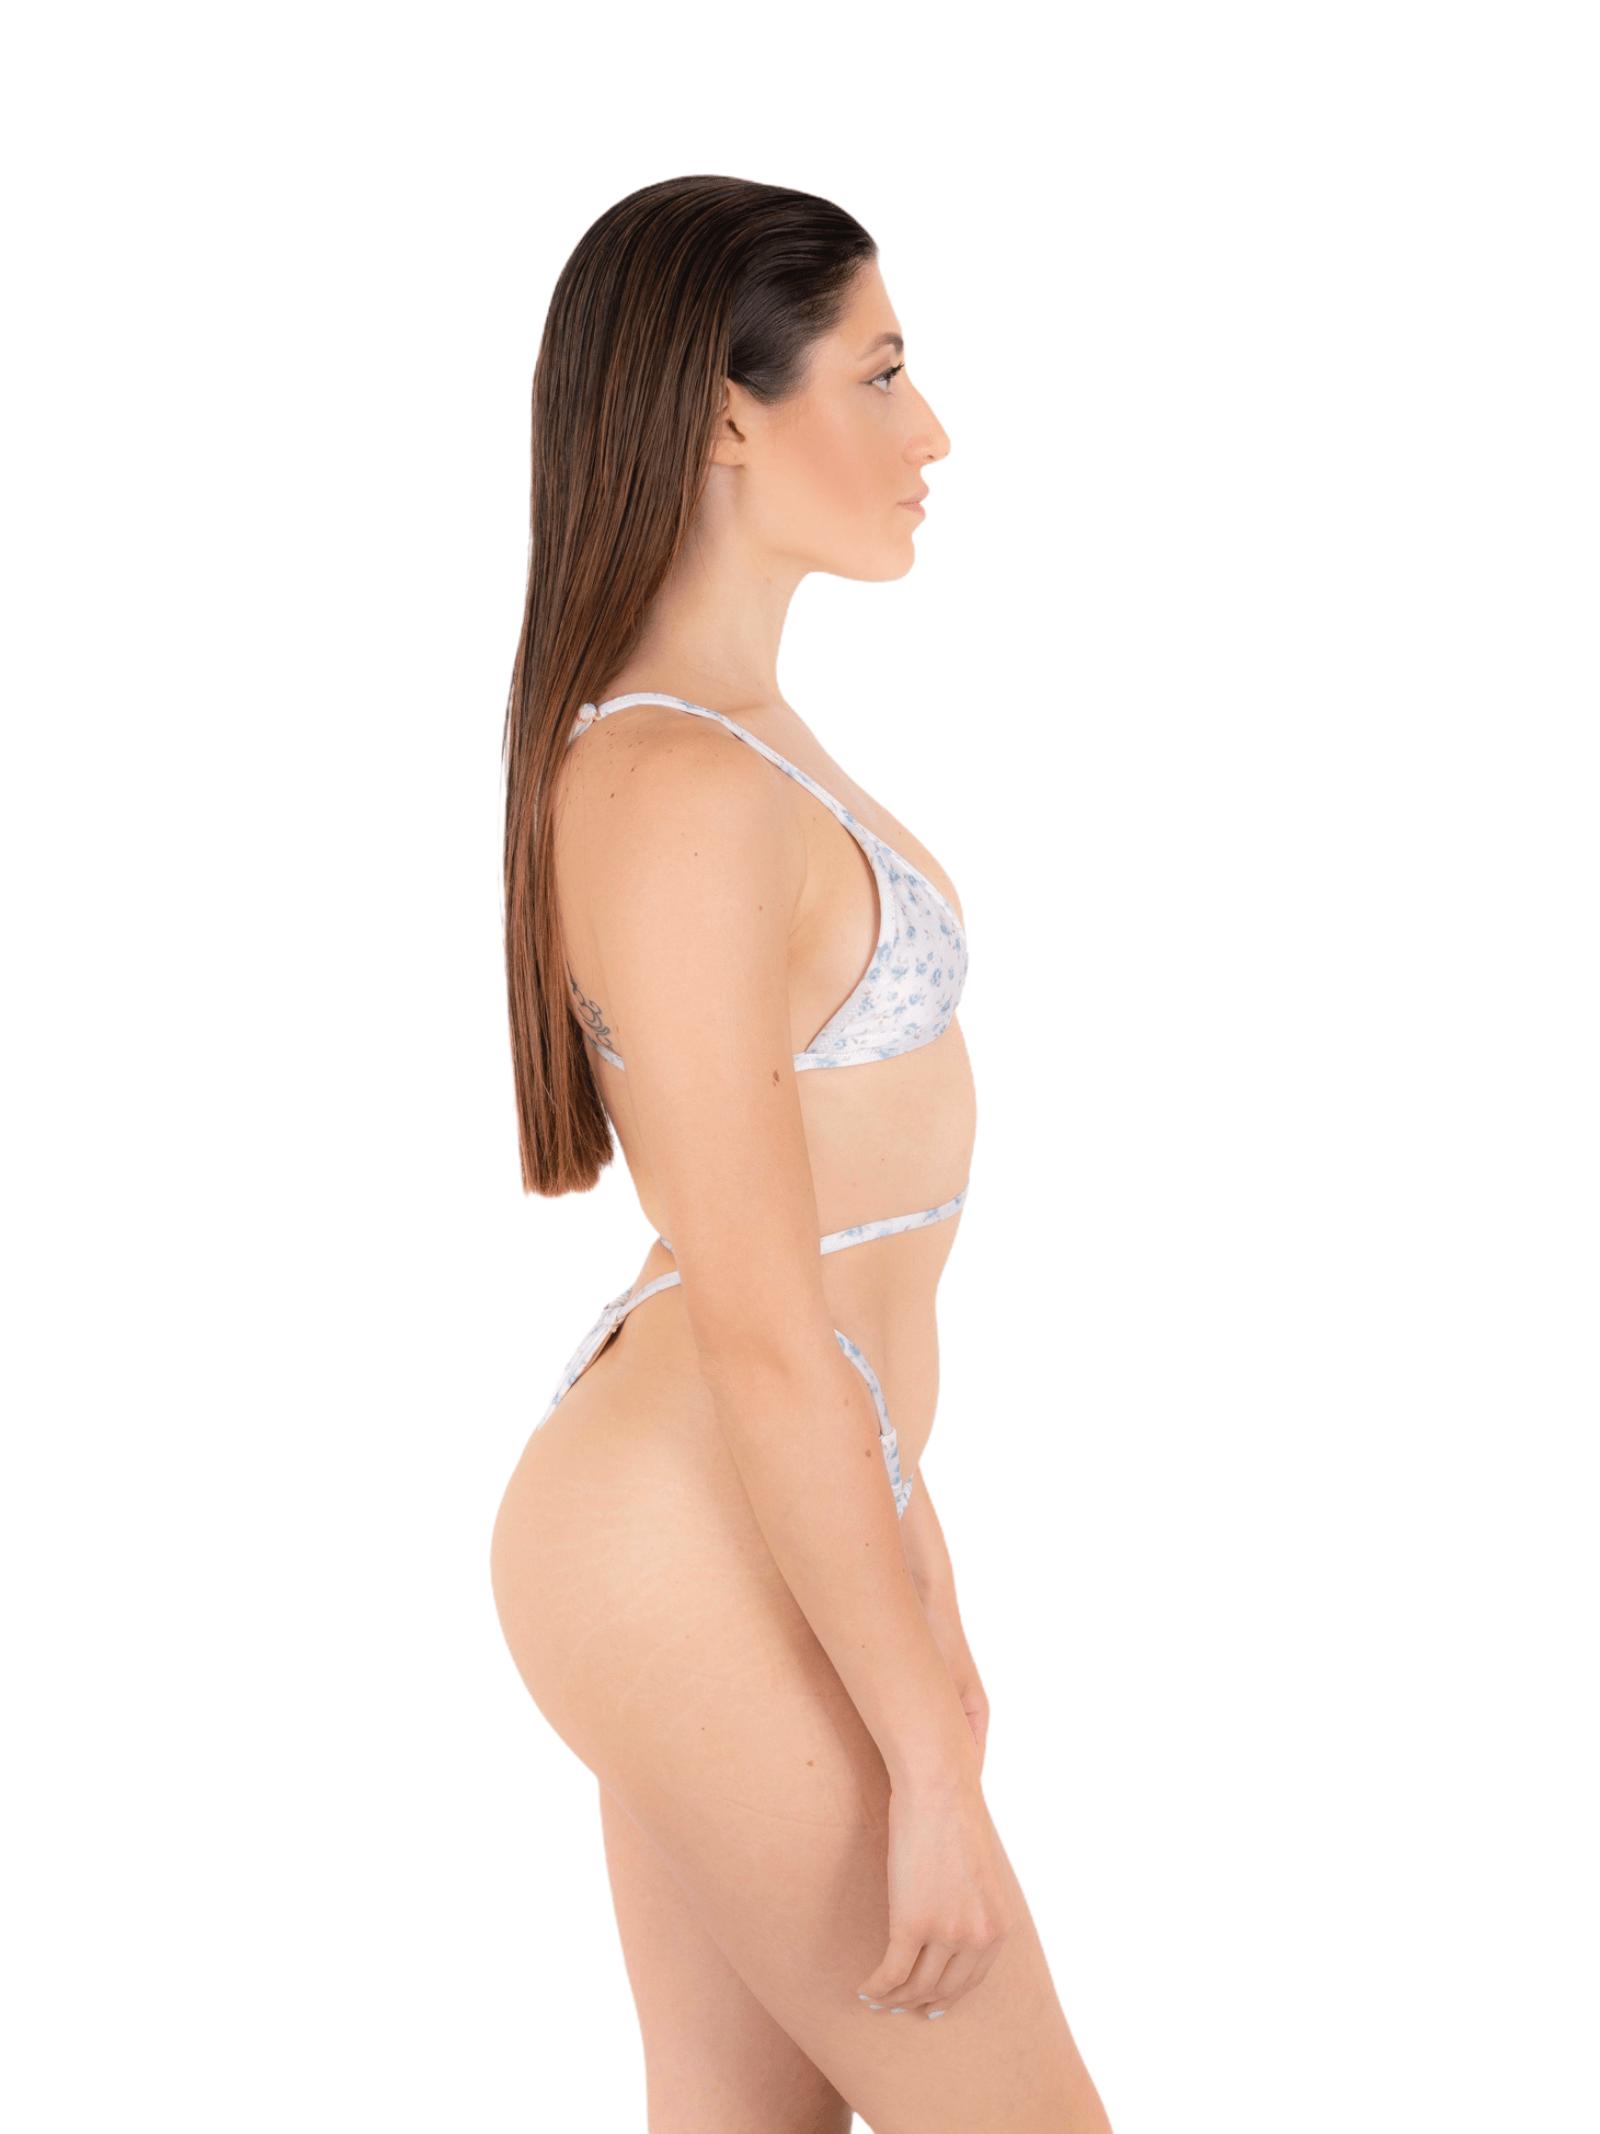 Bikini triangolo con slip tanga ANNAMARE | 23 | BK-133BIANCO